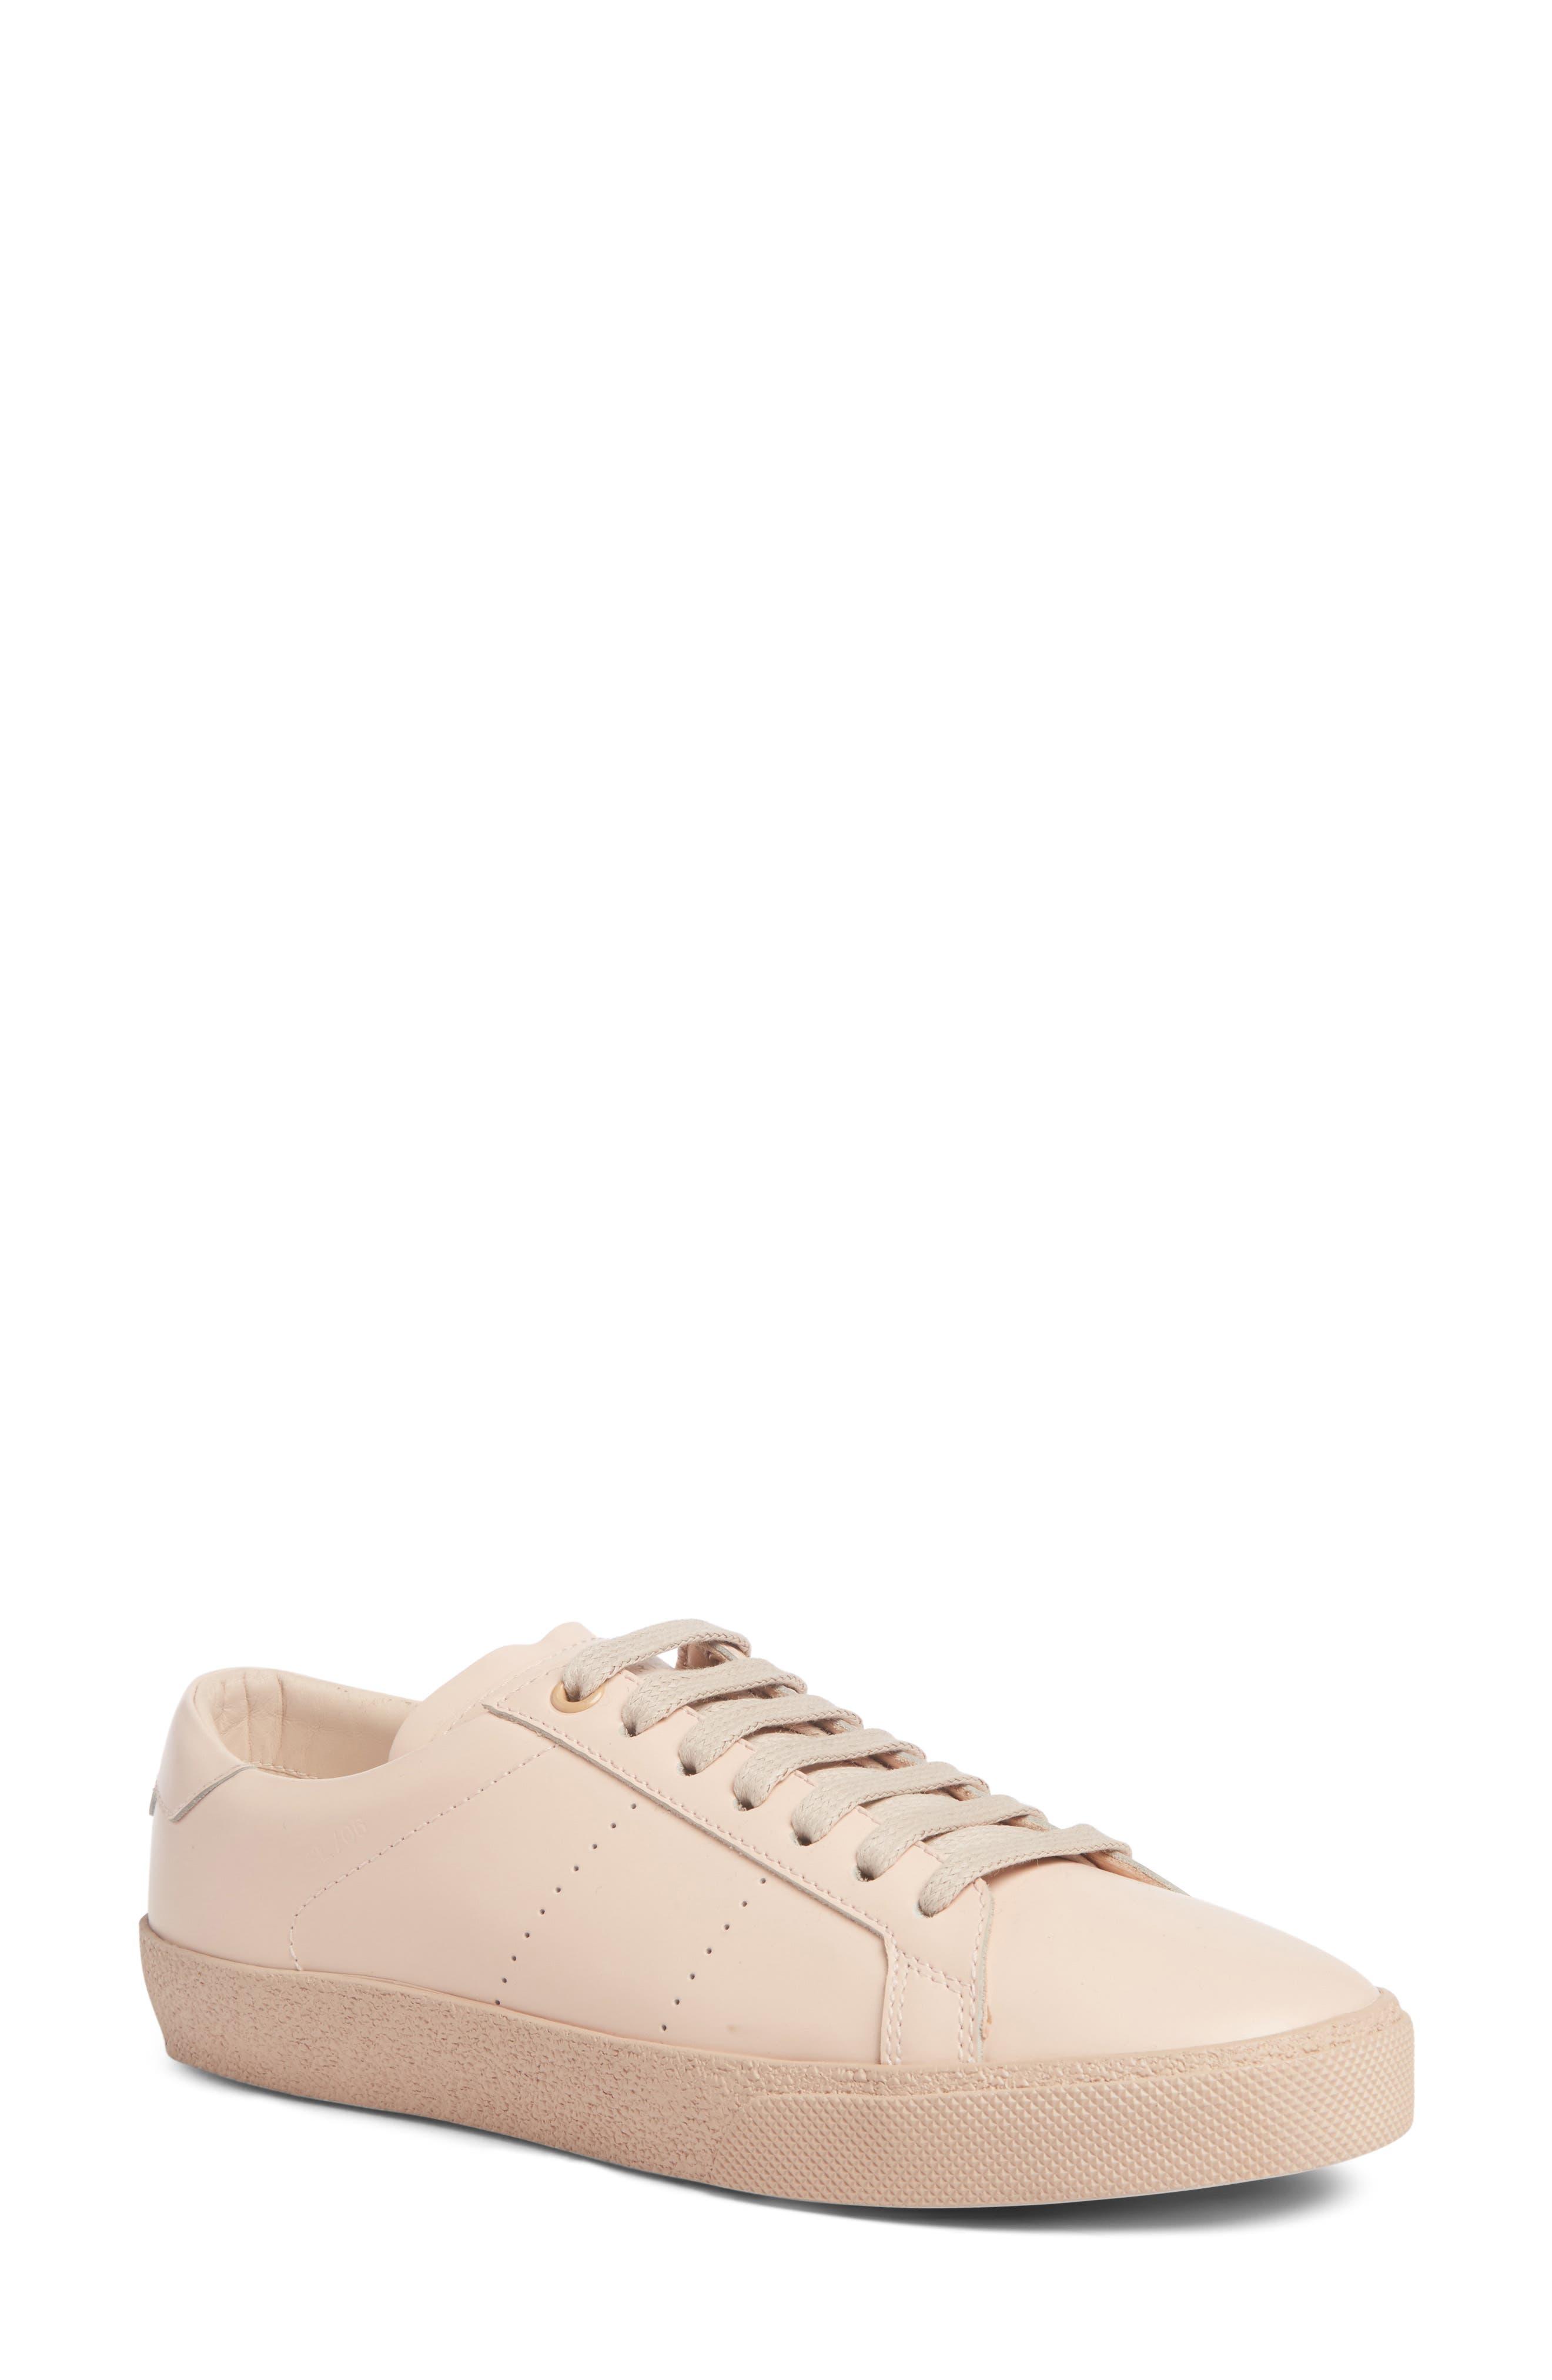 Court Classic Sneaker,                         Main,                         color, 650